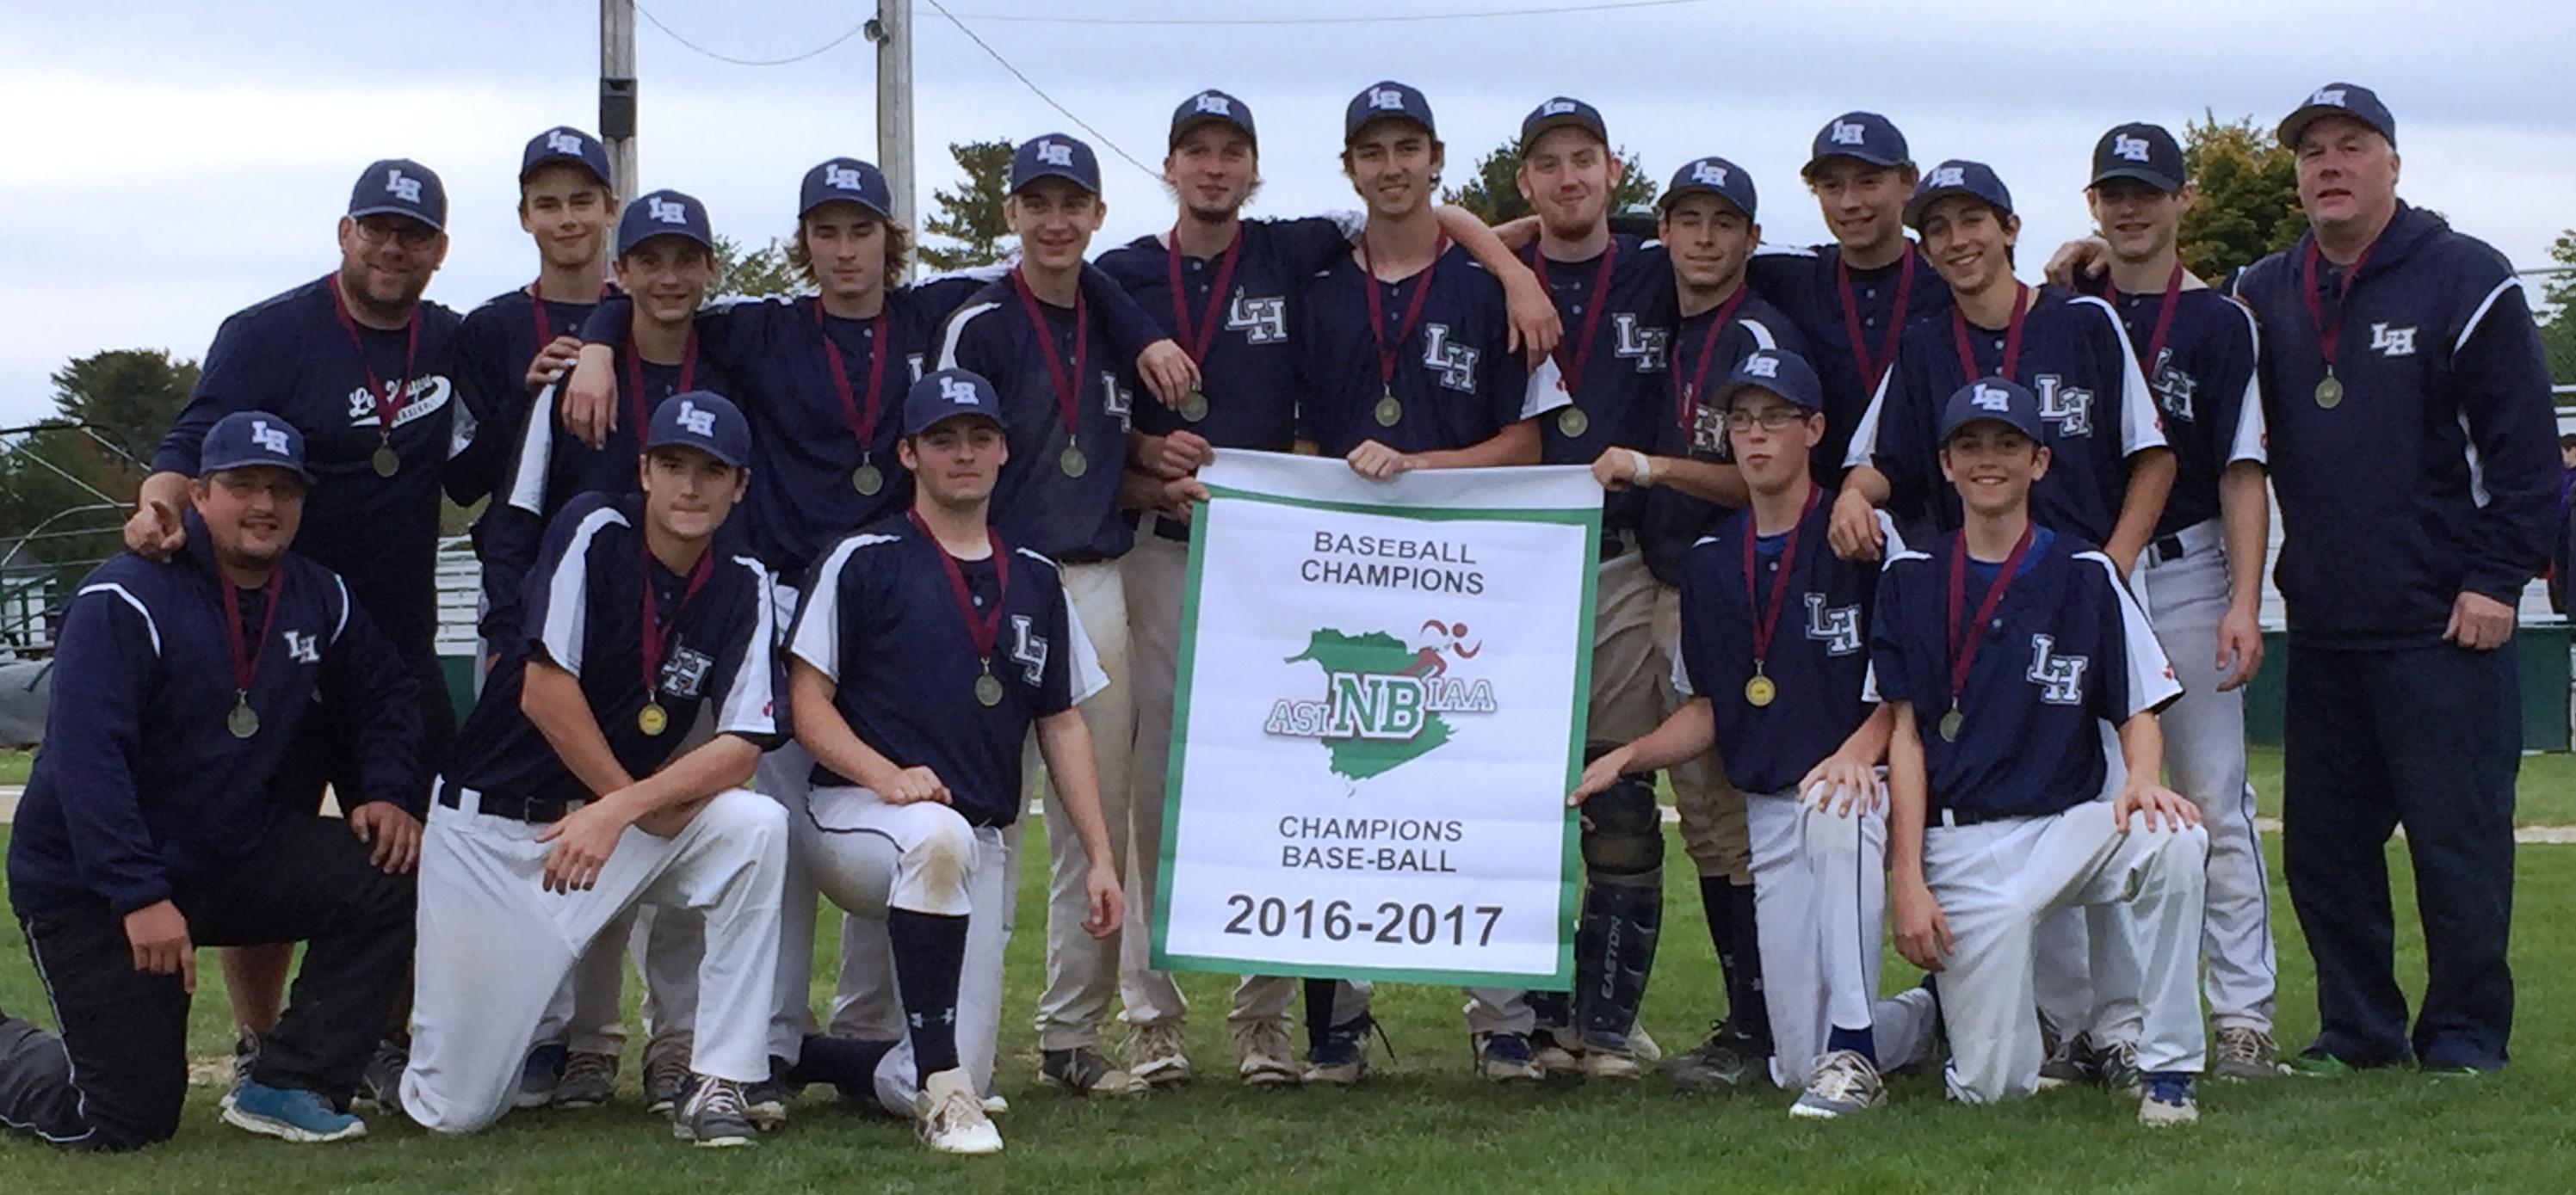 Baseball Champions 2016 - LHHS